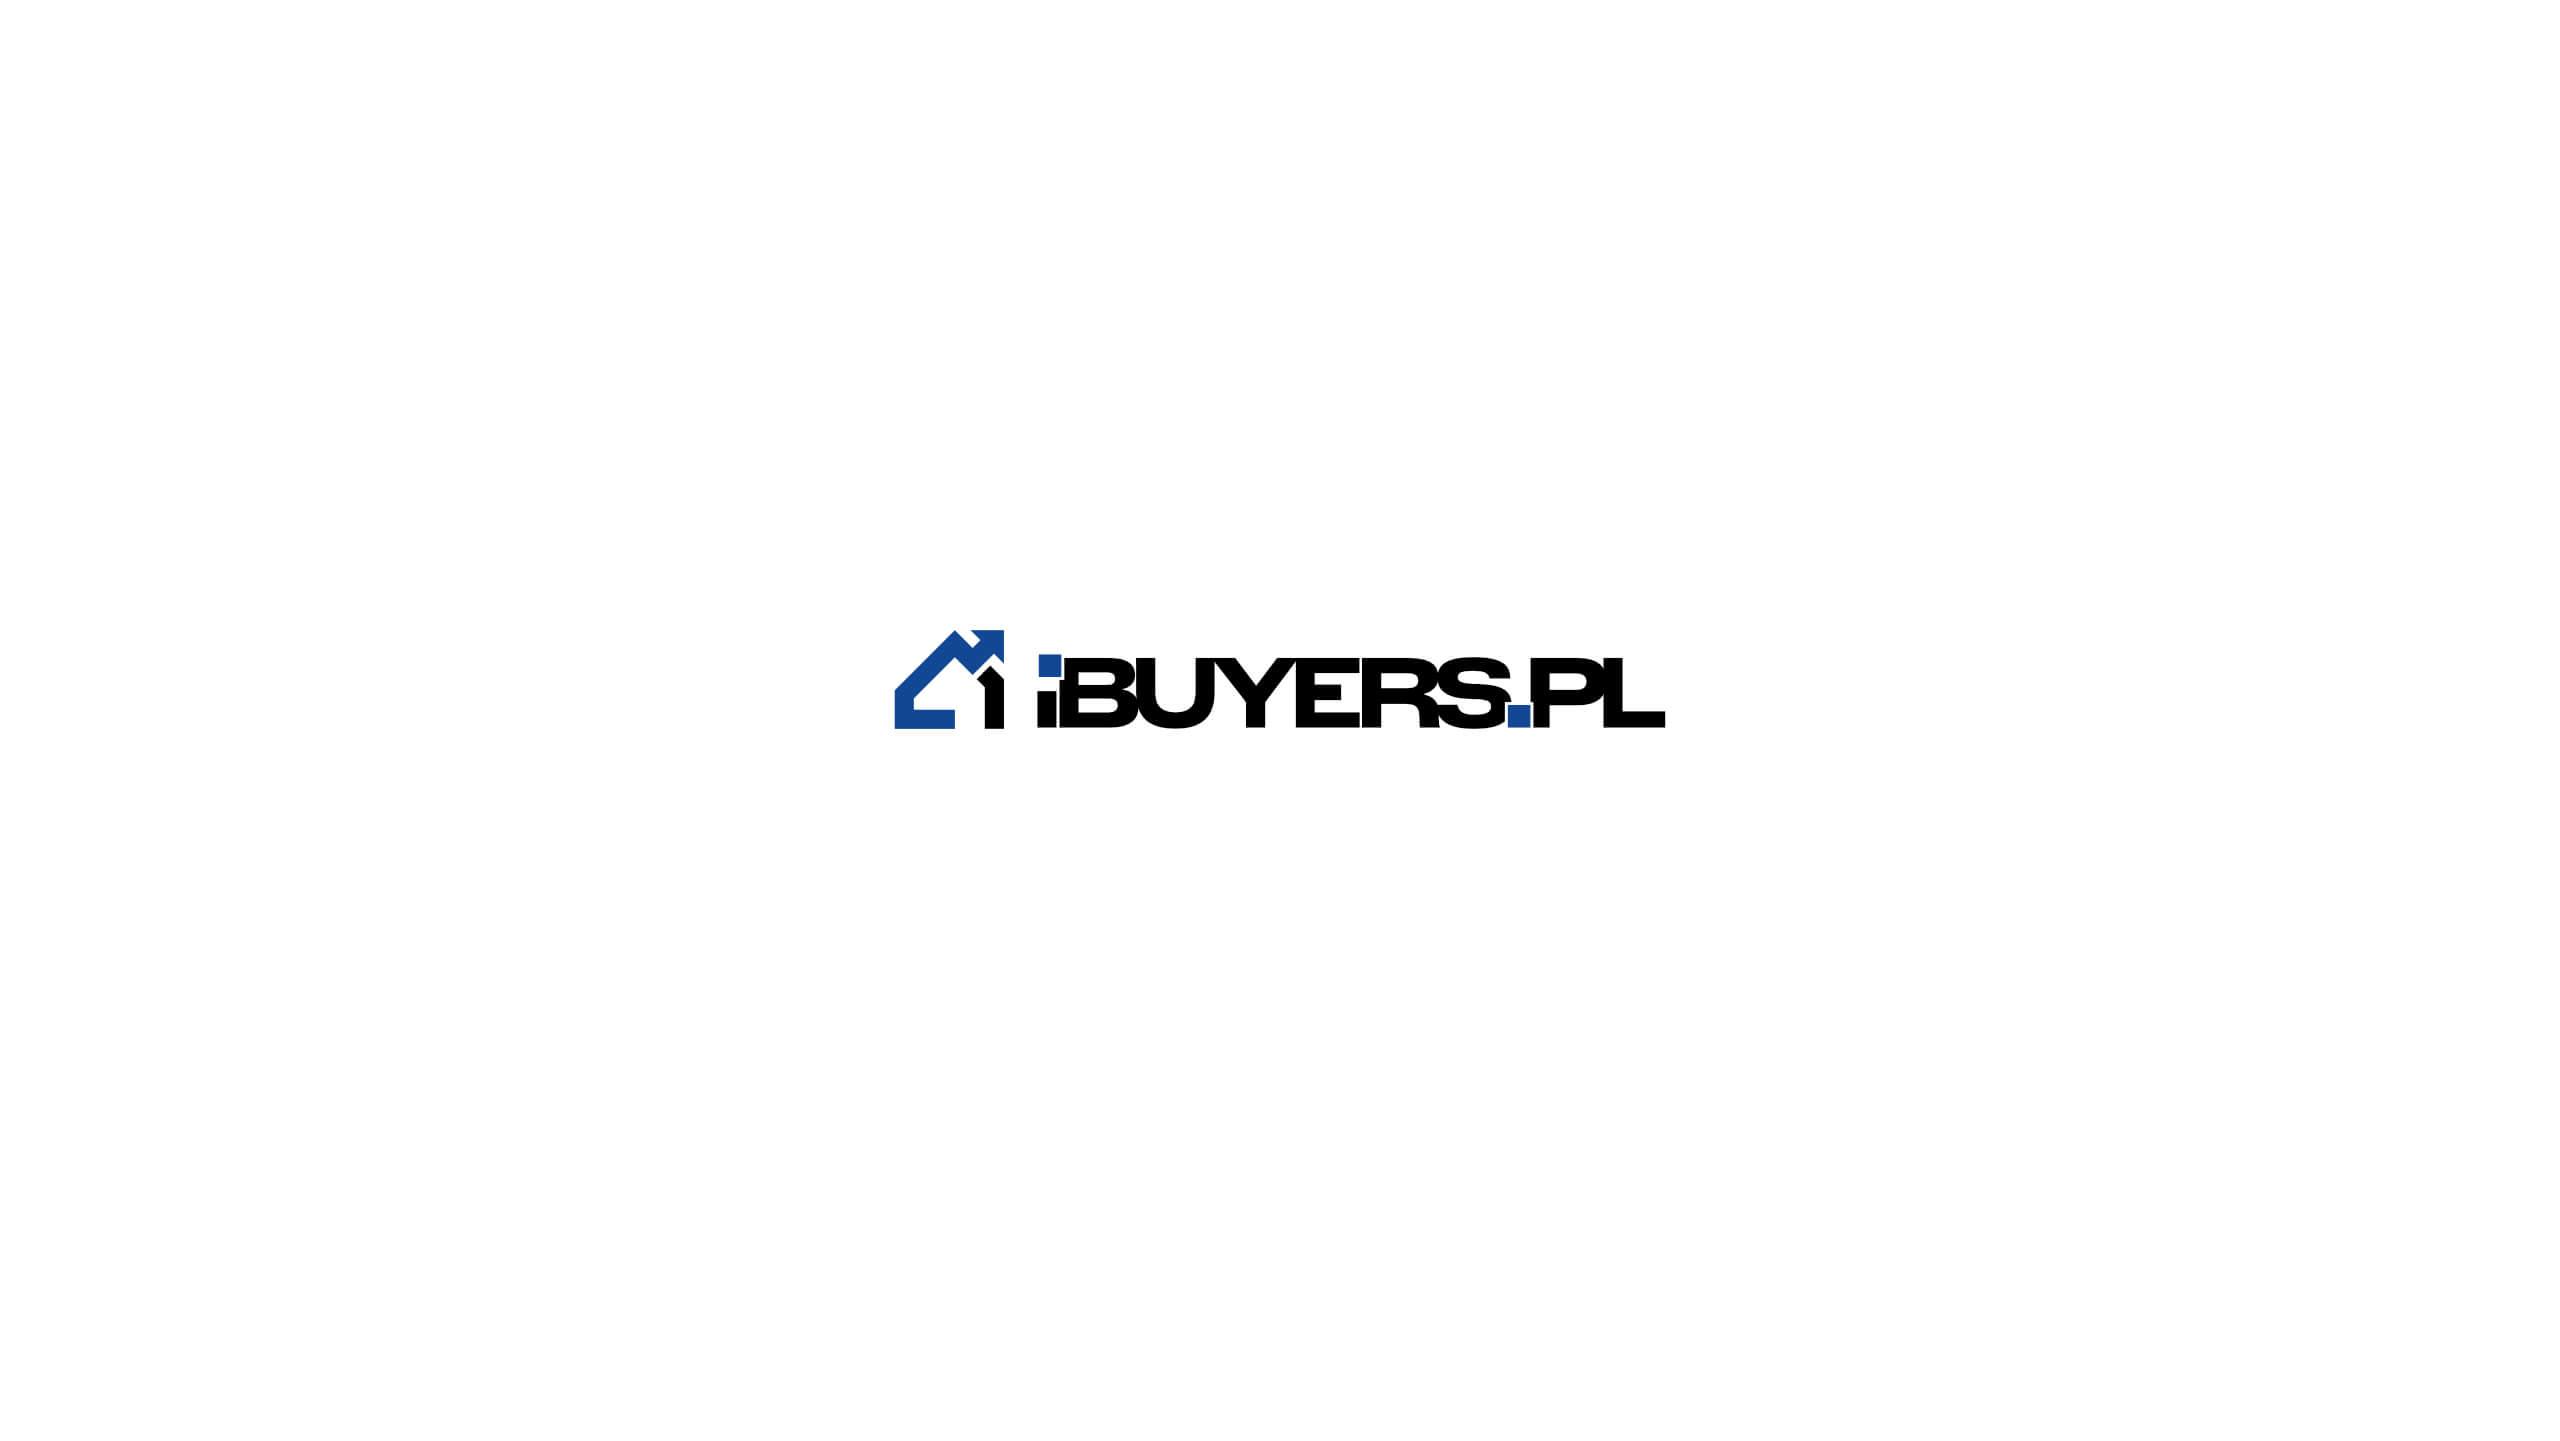 ibuyers.pl - Projekt logo